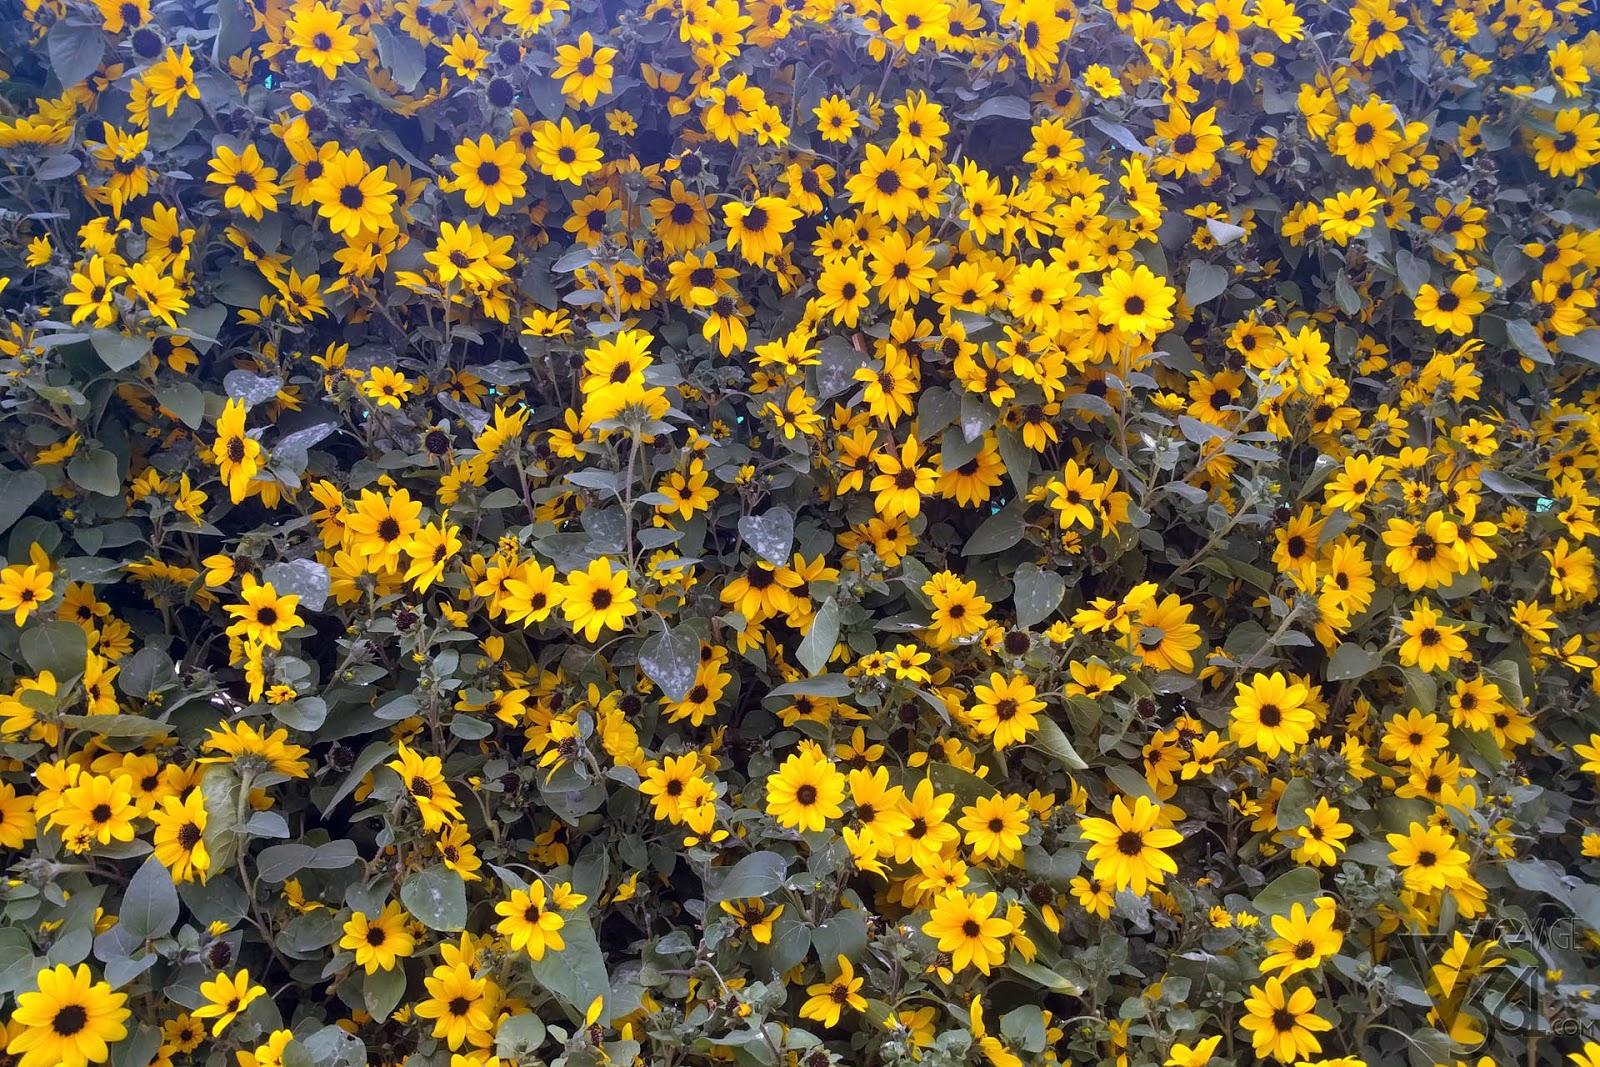 Lalbagh flower show jan 2018 voyage 361 corner display of yellow annual flowers izmirmasajfo